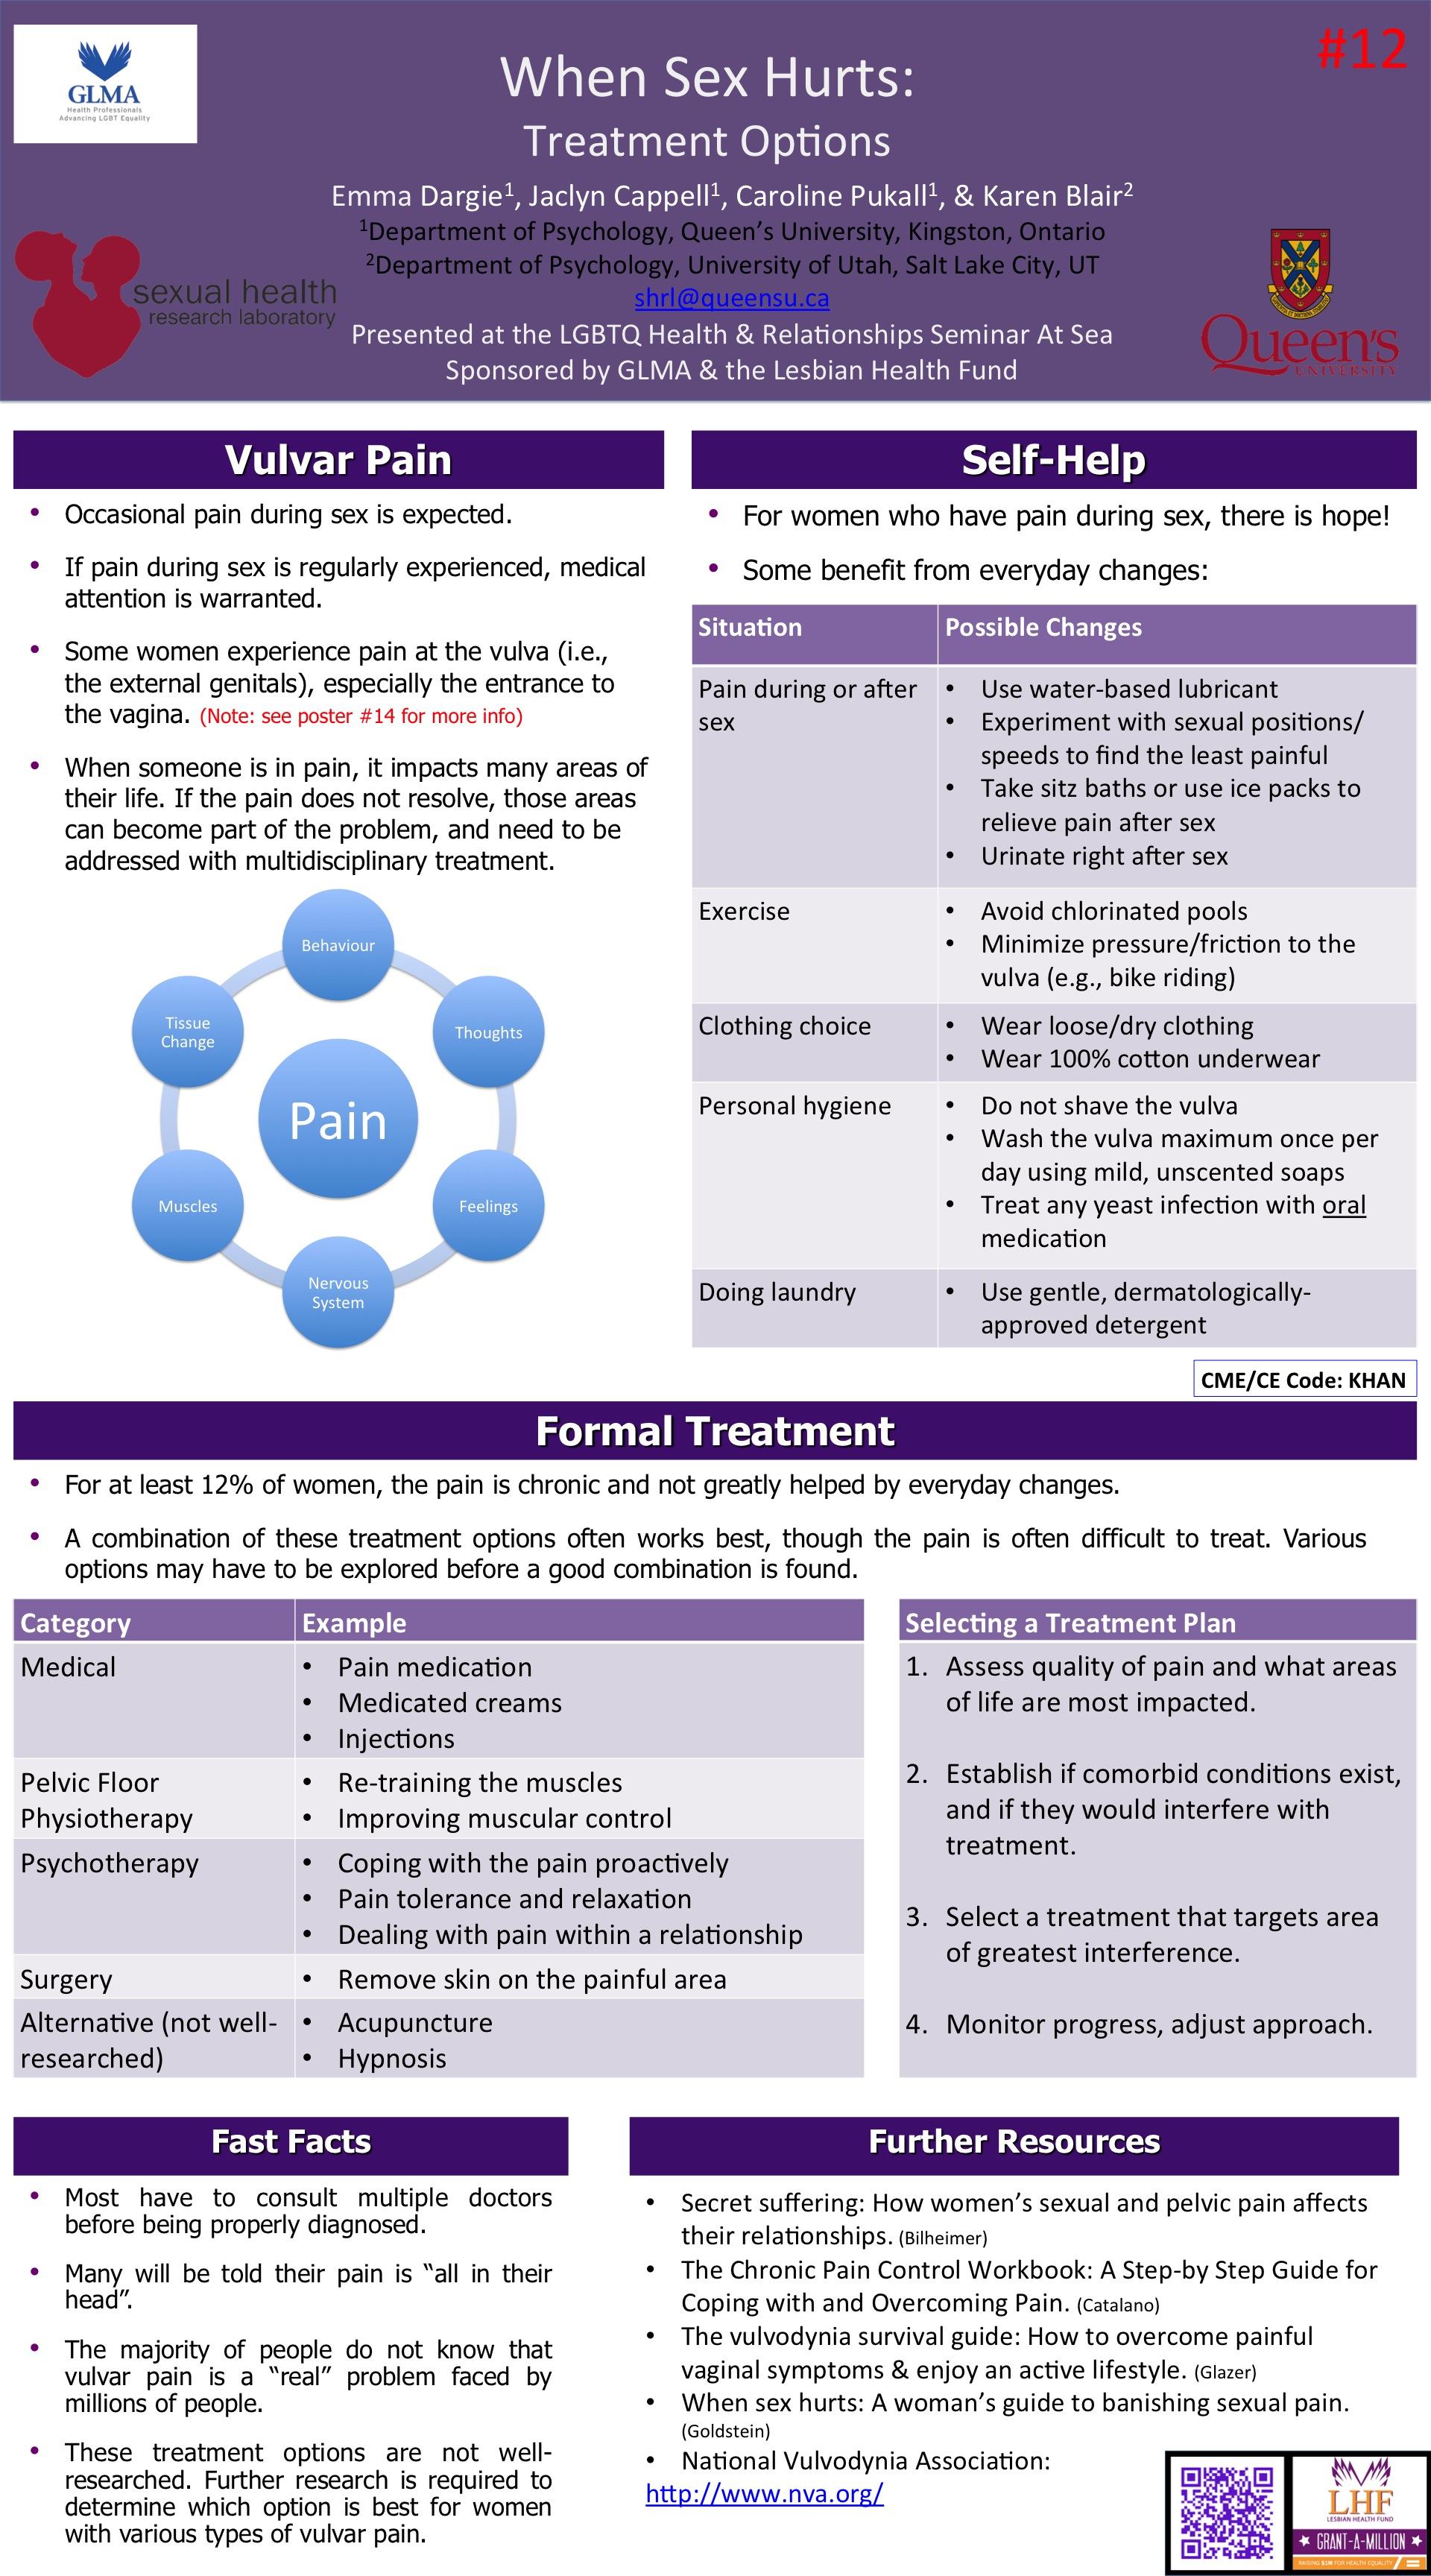 Treatment for Vulvar Pain